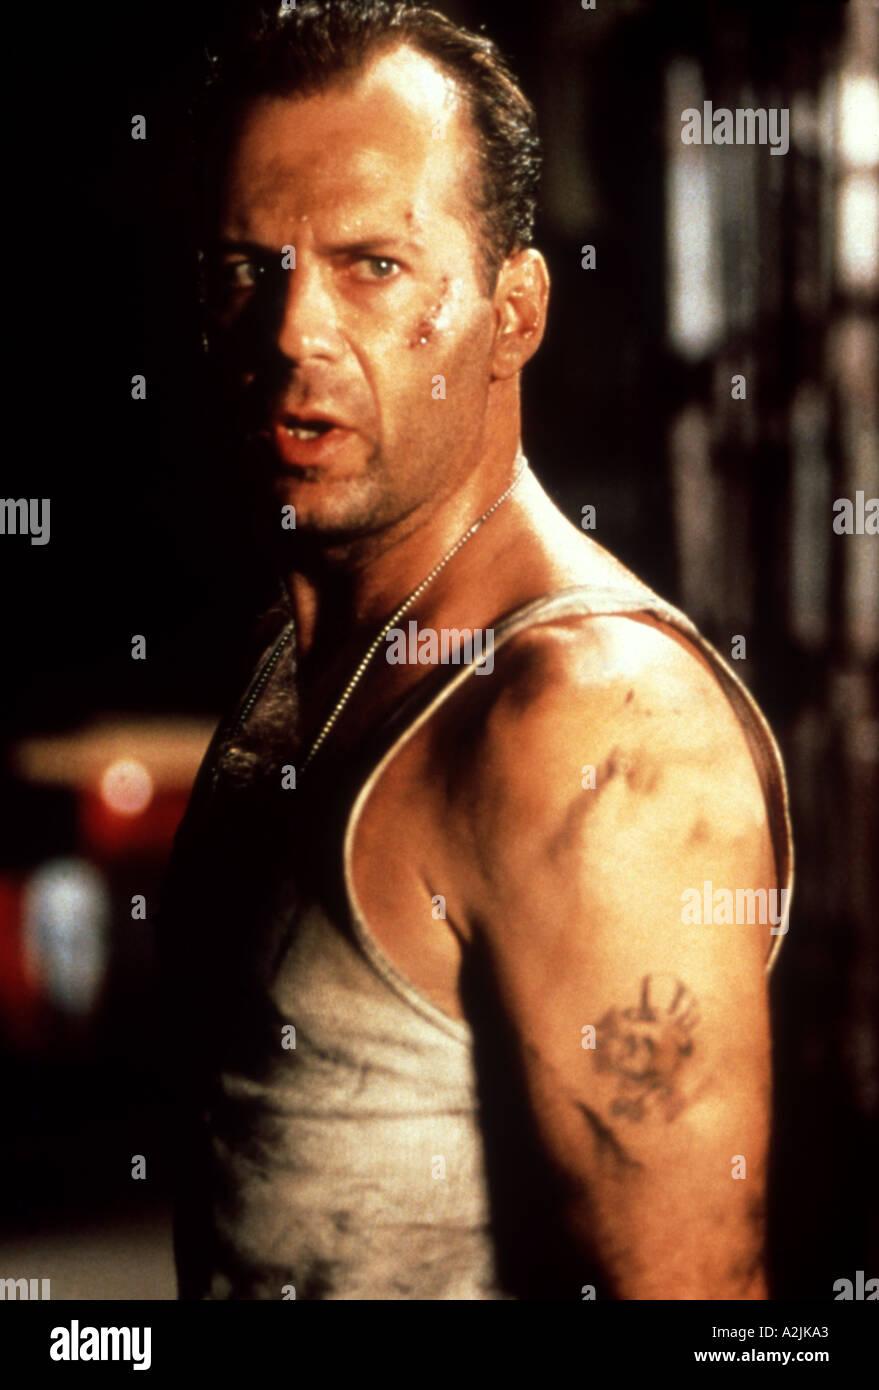 DIE HARD 3 1995 film starring Bruce Willis - Stock Image